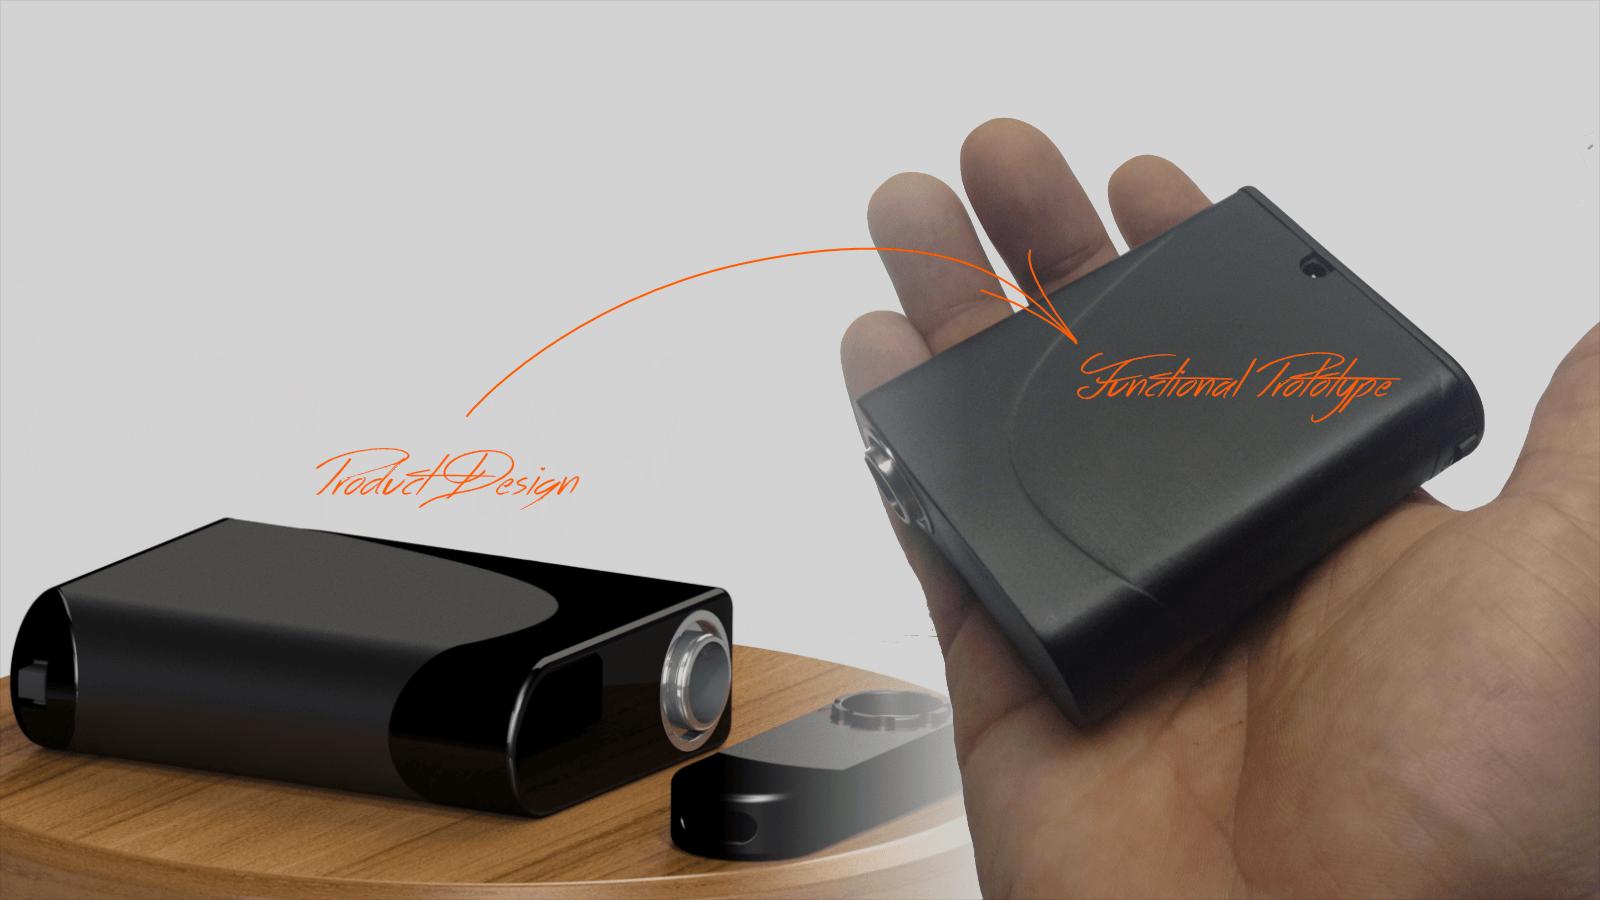 vaporizer_product design to functional prototype